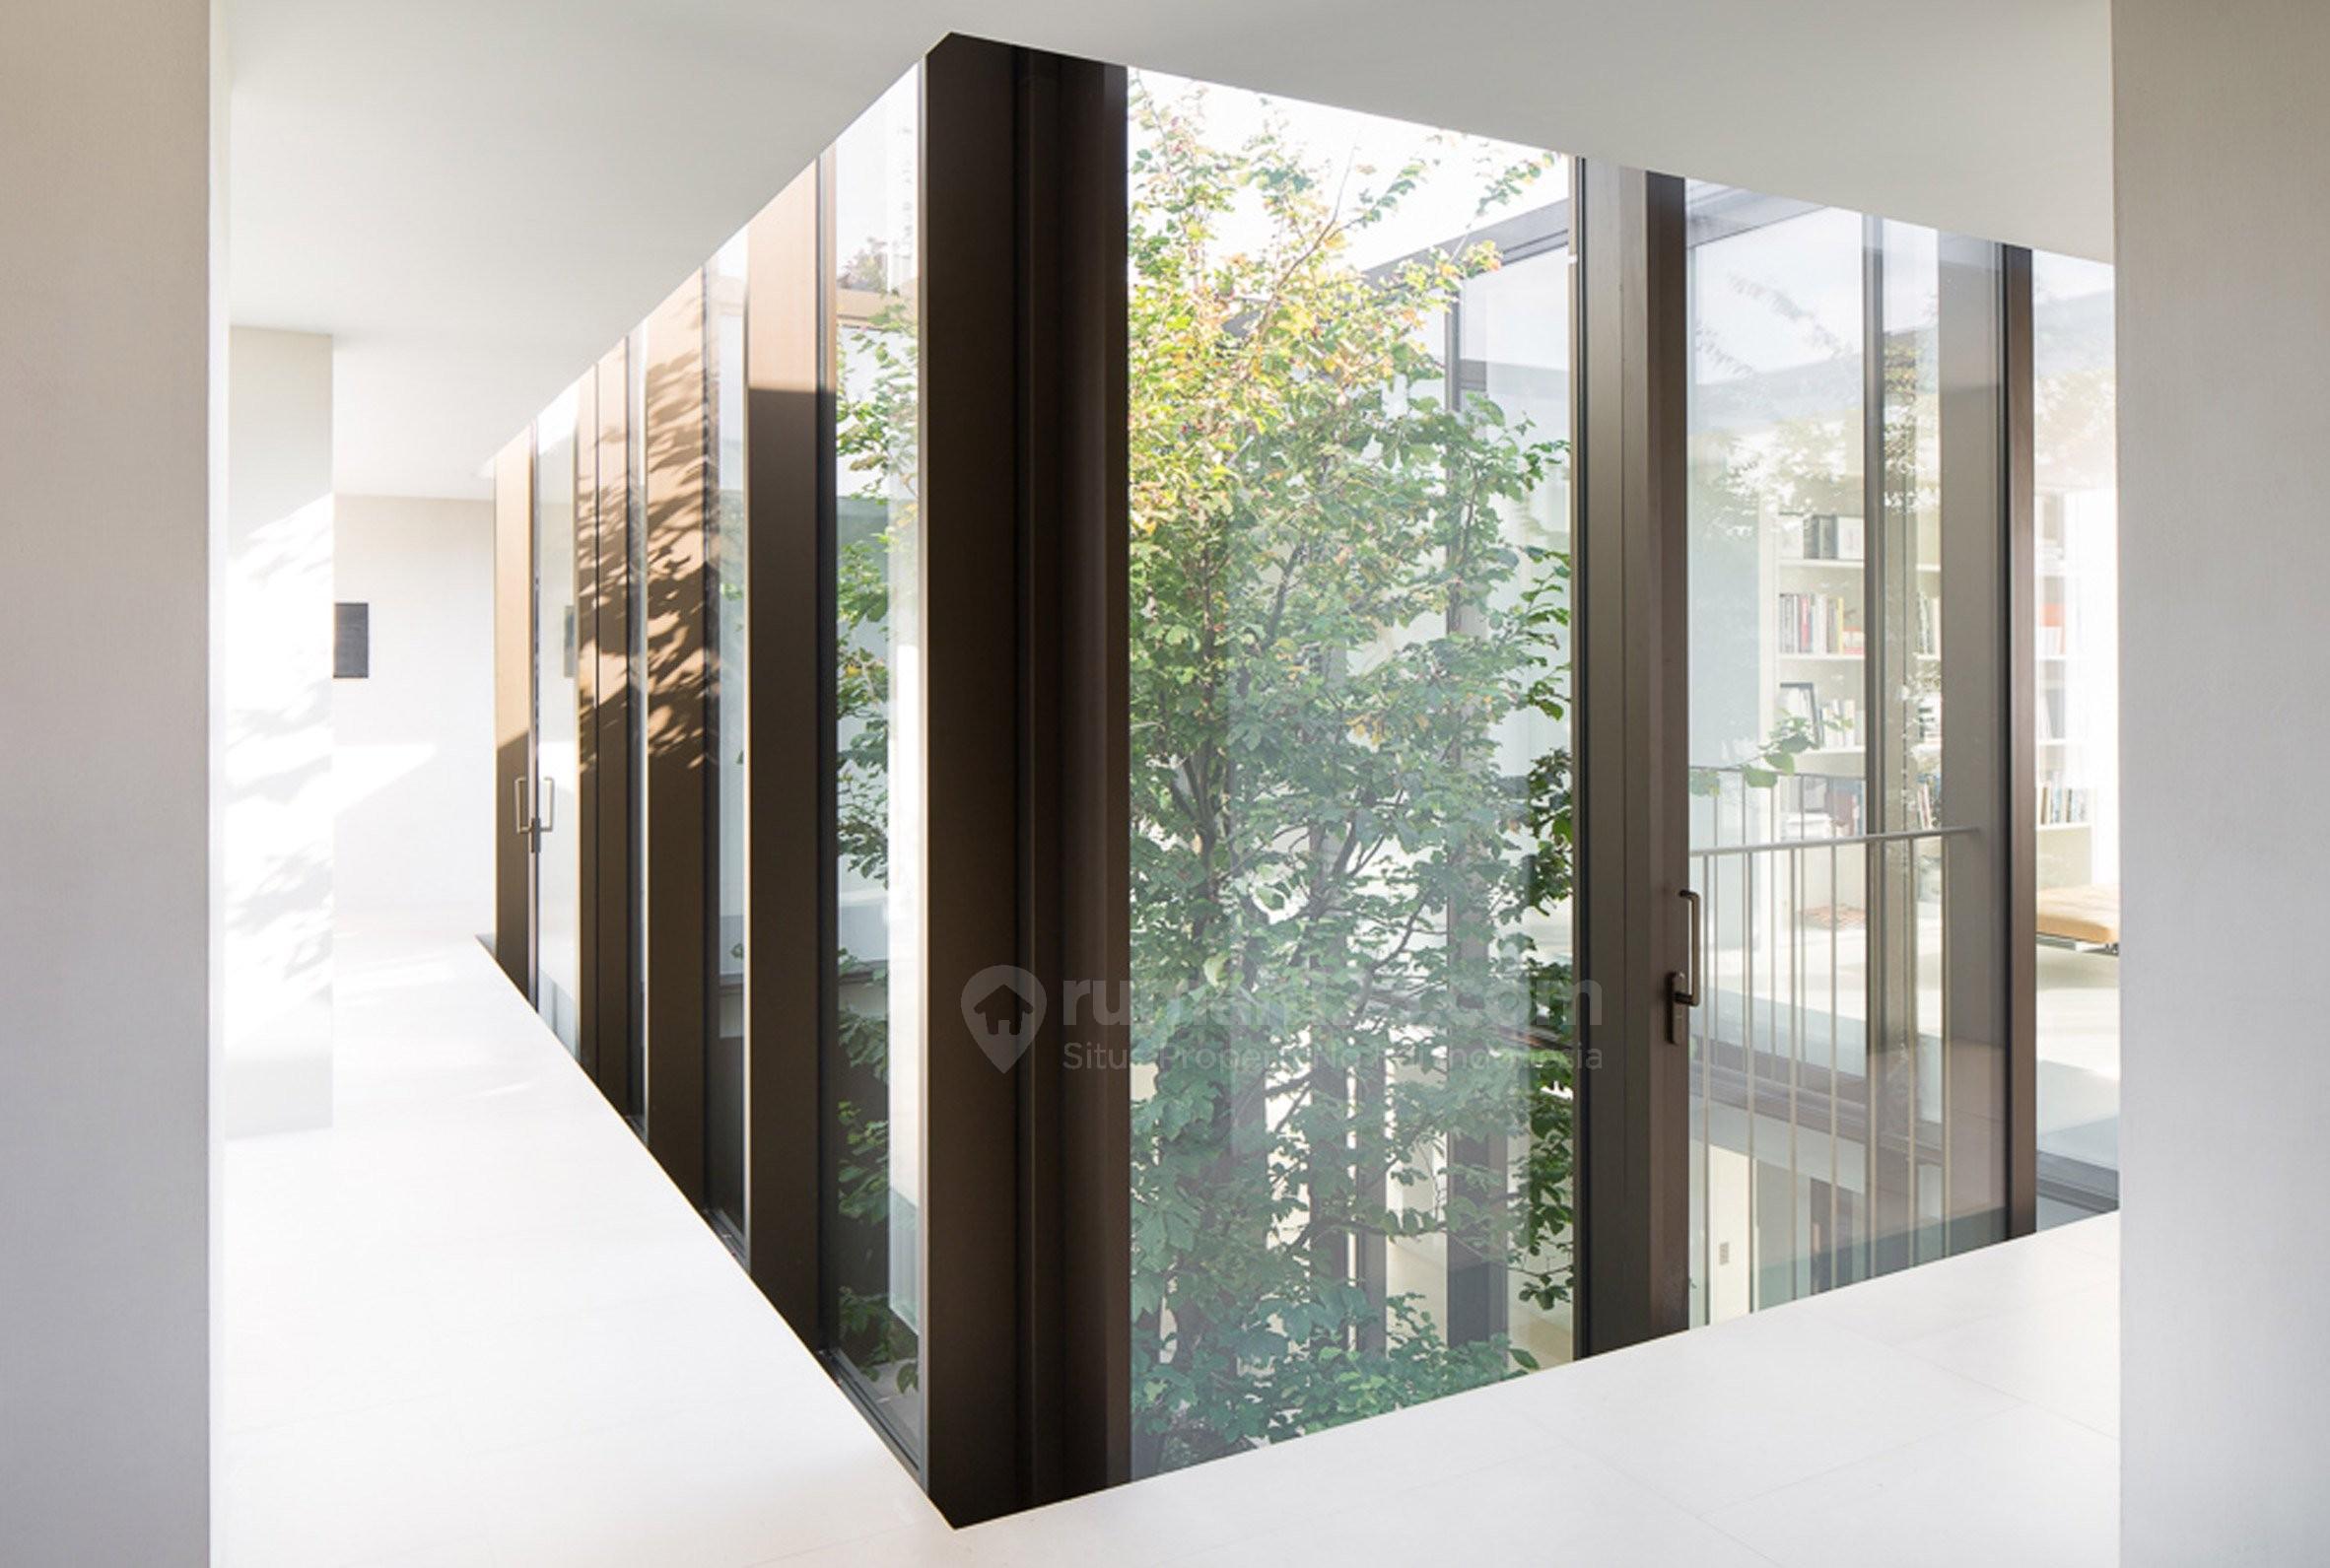 hans-verstuyft-architecten-glass